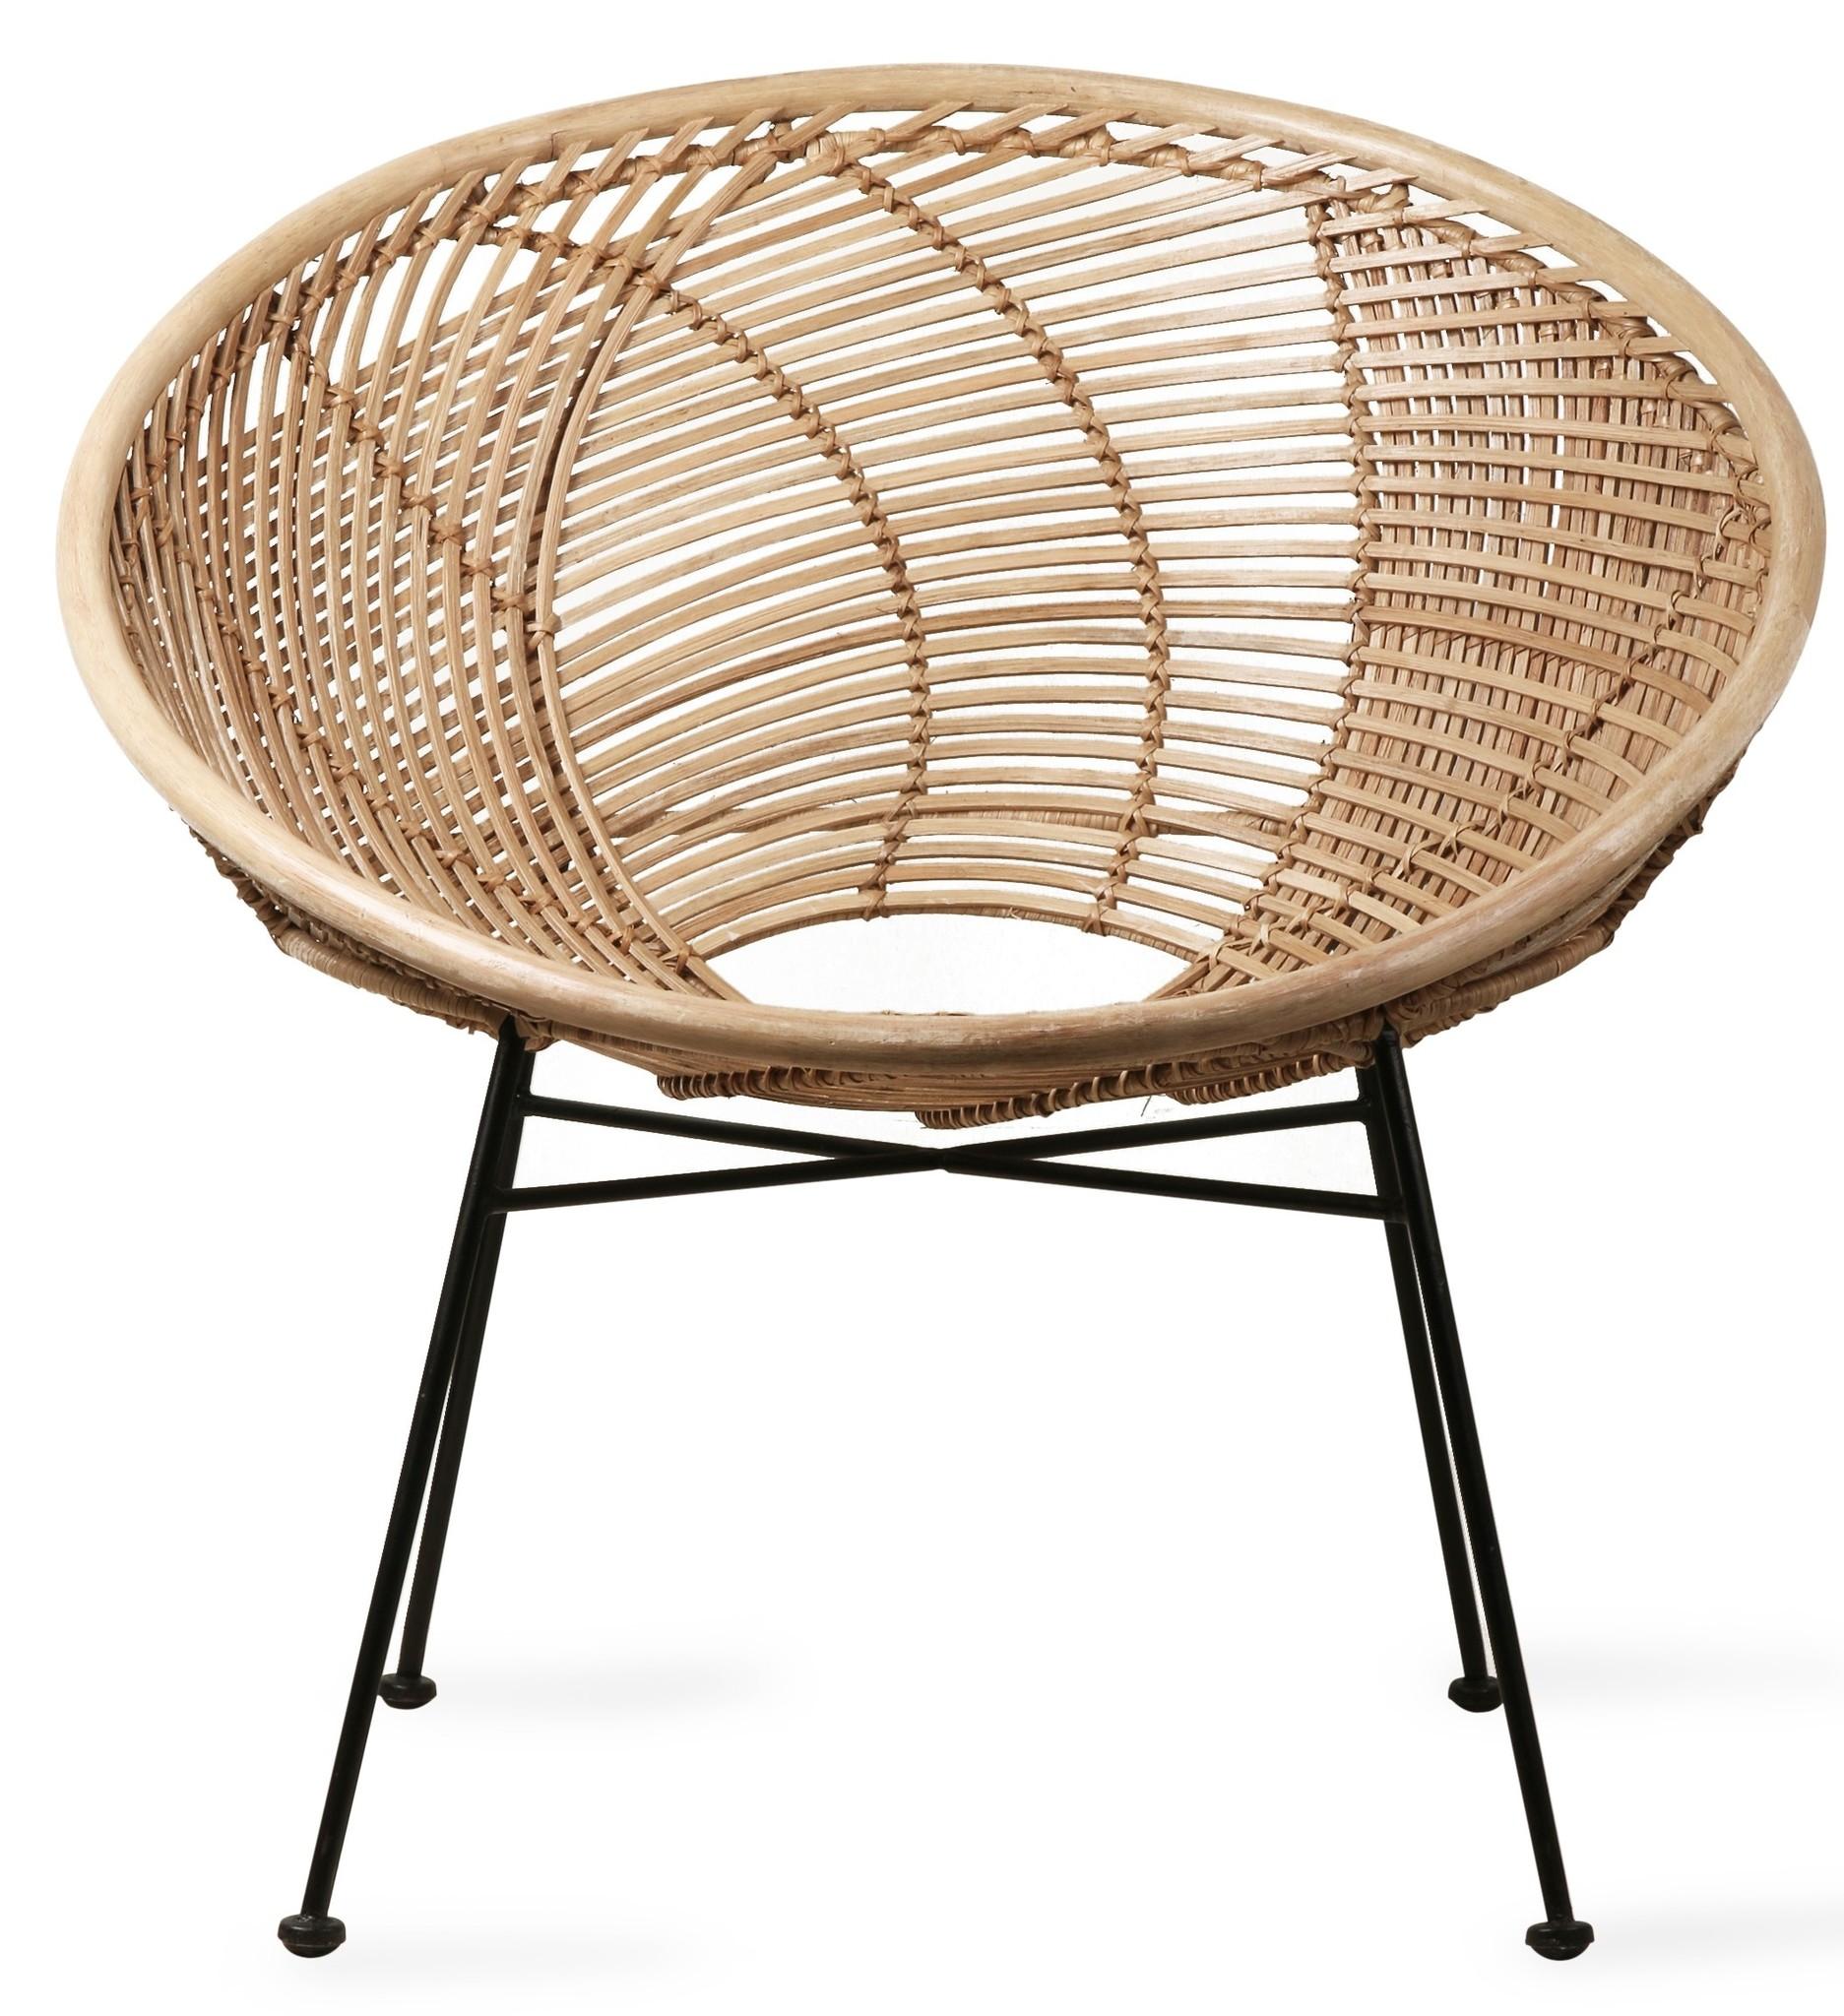 Stoel rattan ball lounge chair natural-3